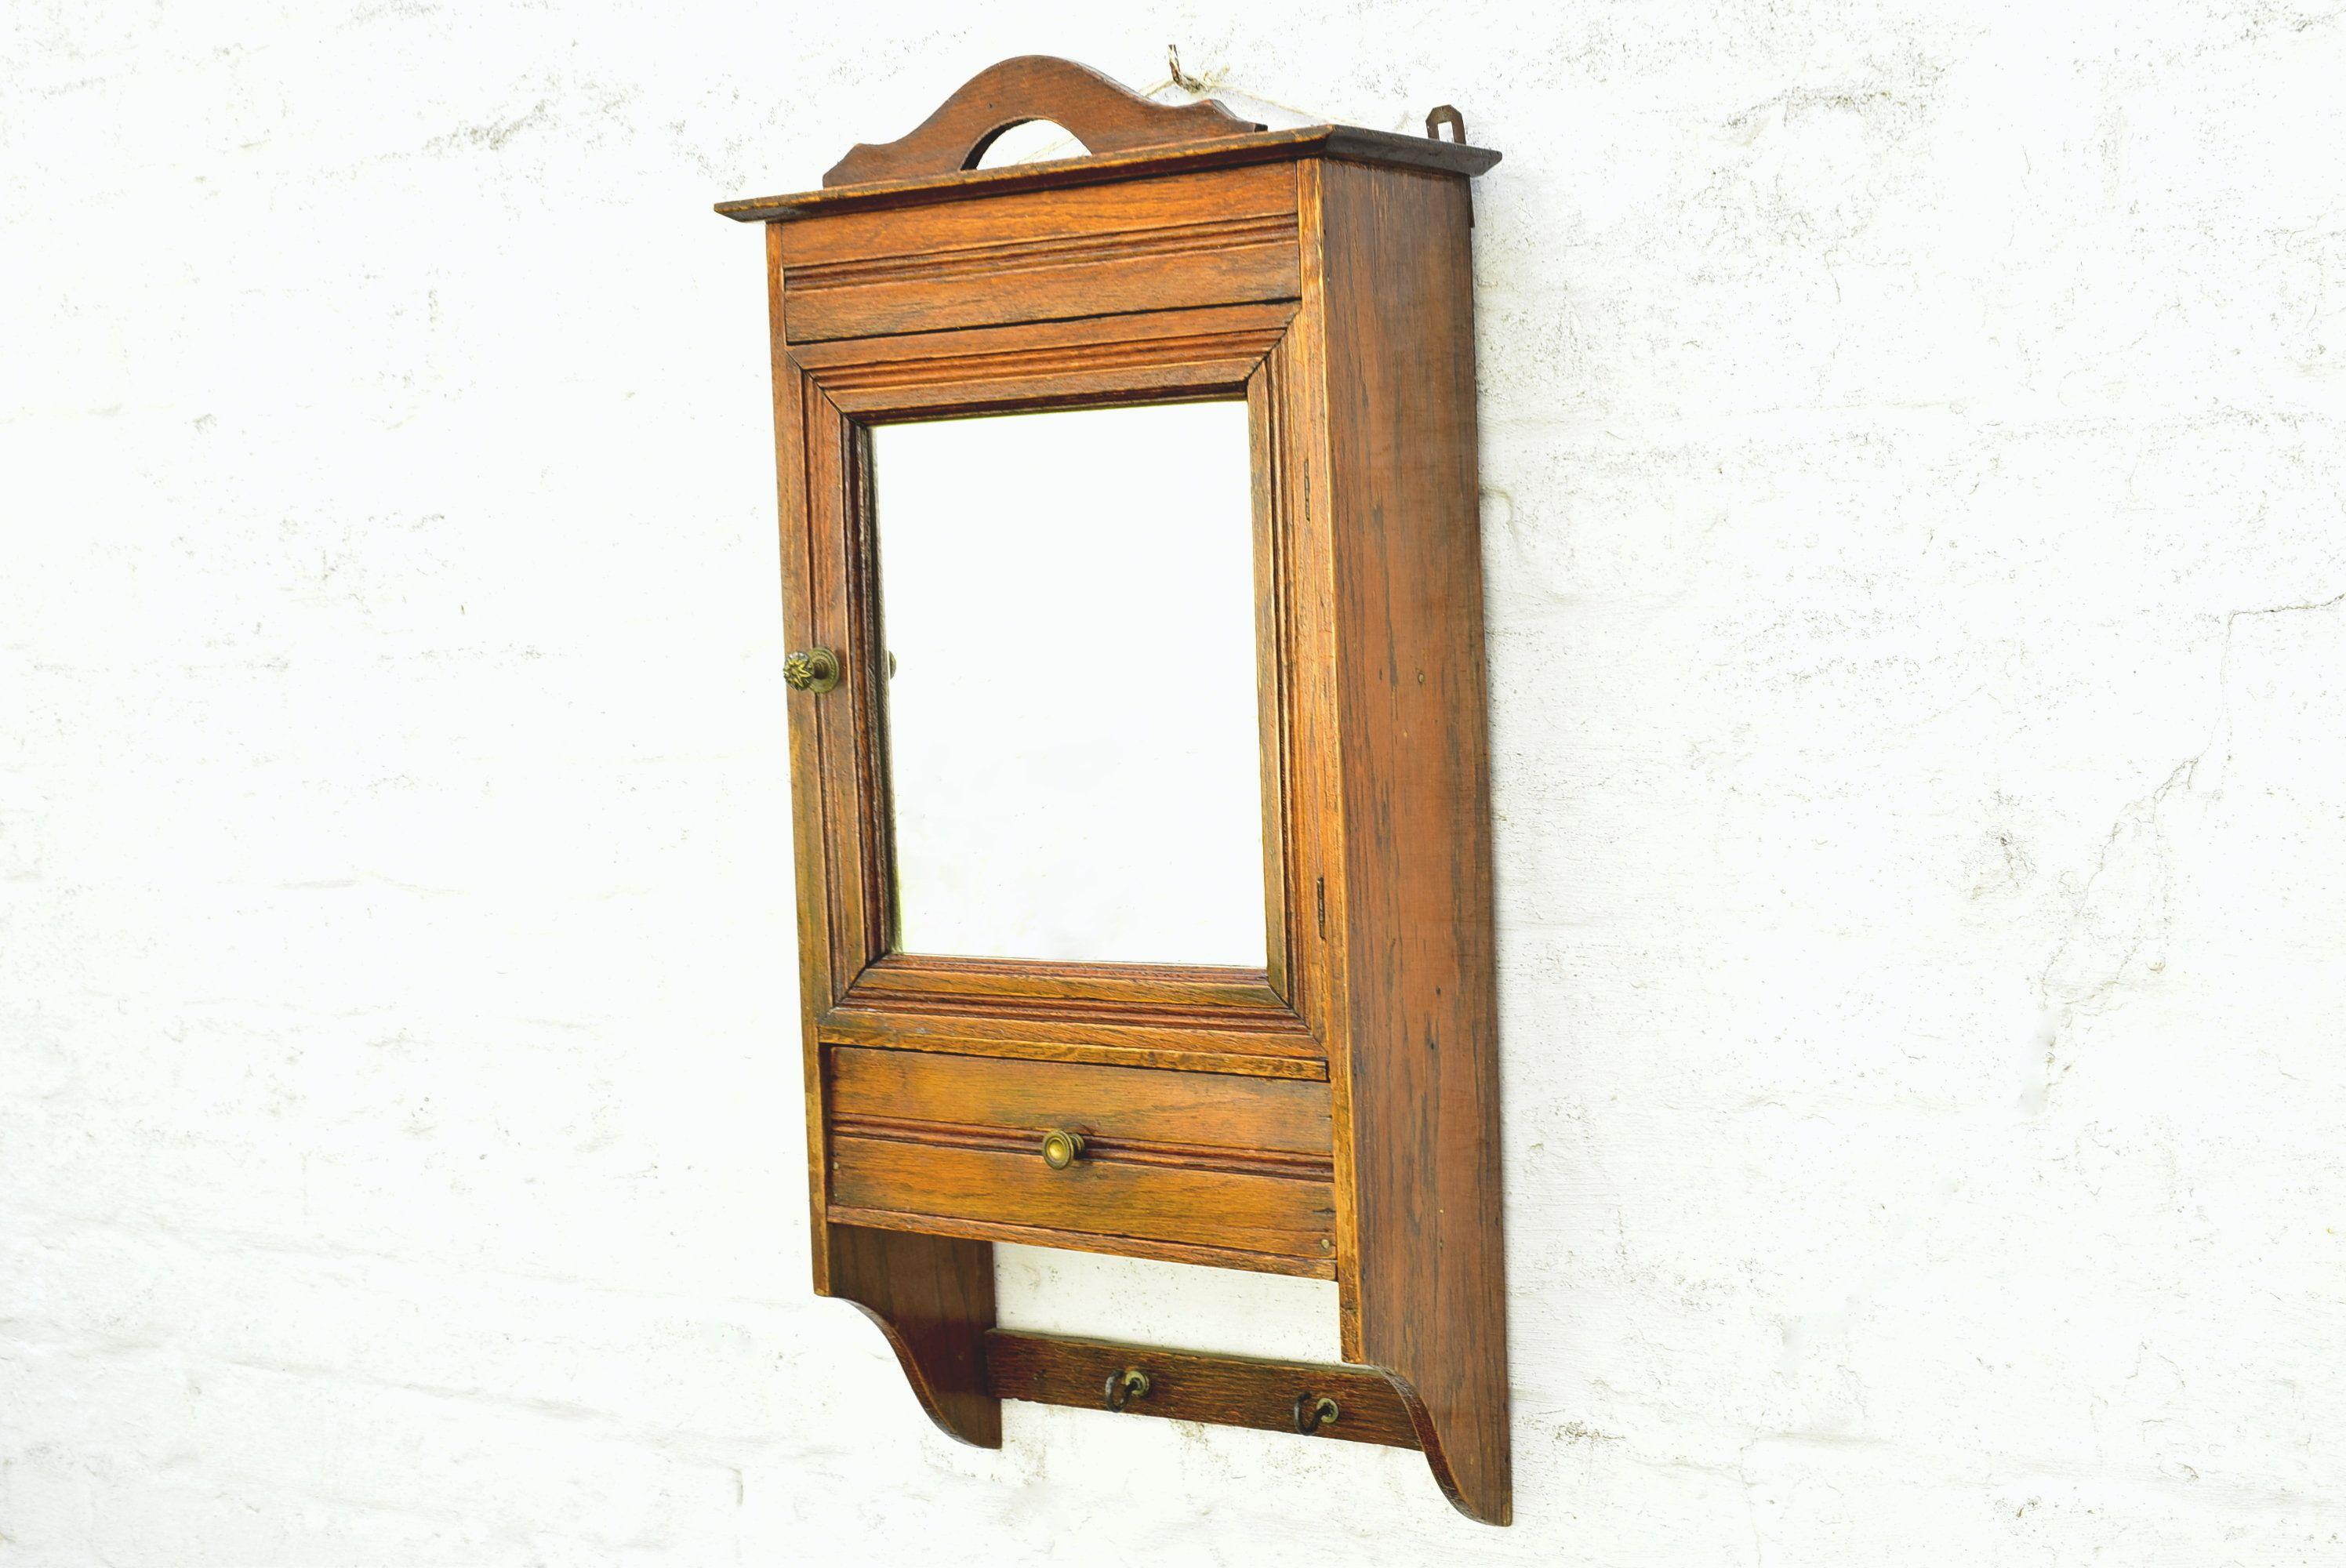 Antique Wall Cabinet Vintage Kitchen Or Bathroom Storage Etsy Antique Wall Cabinet Wall Cabinet Vintage Kitchen